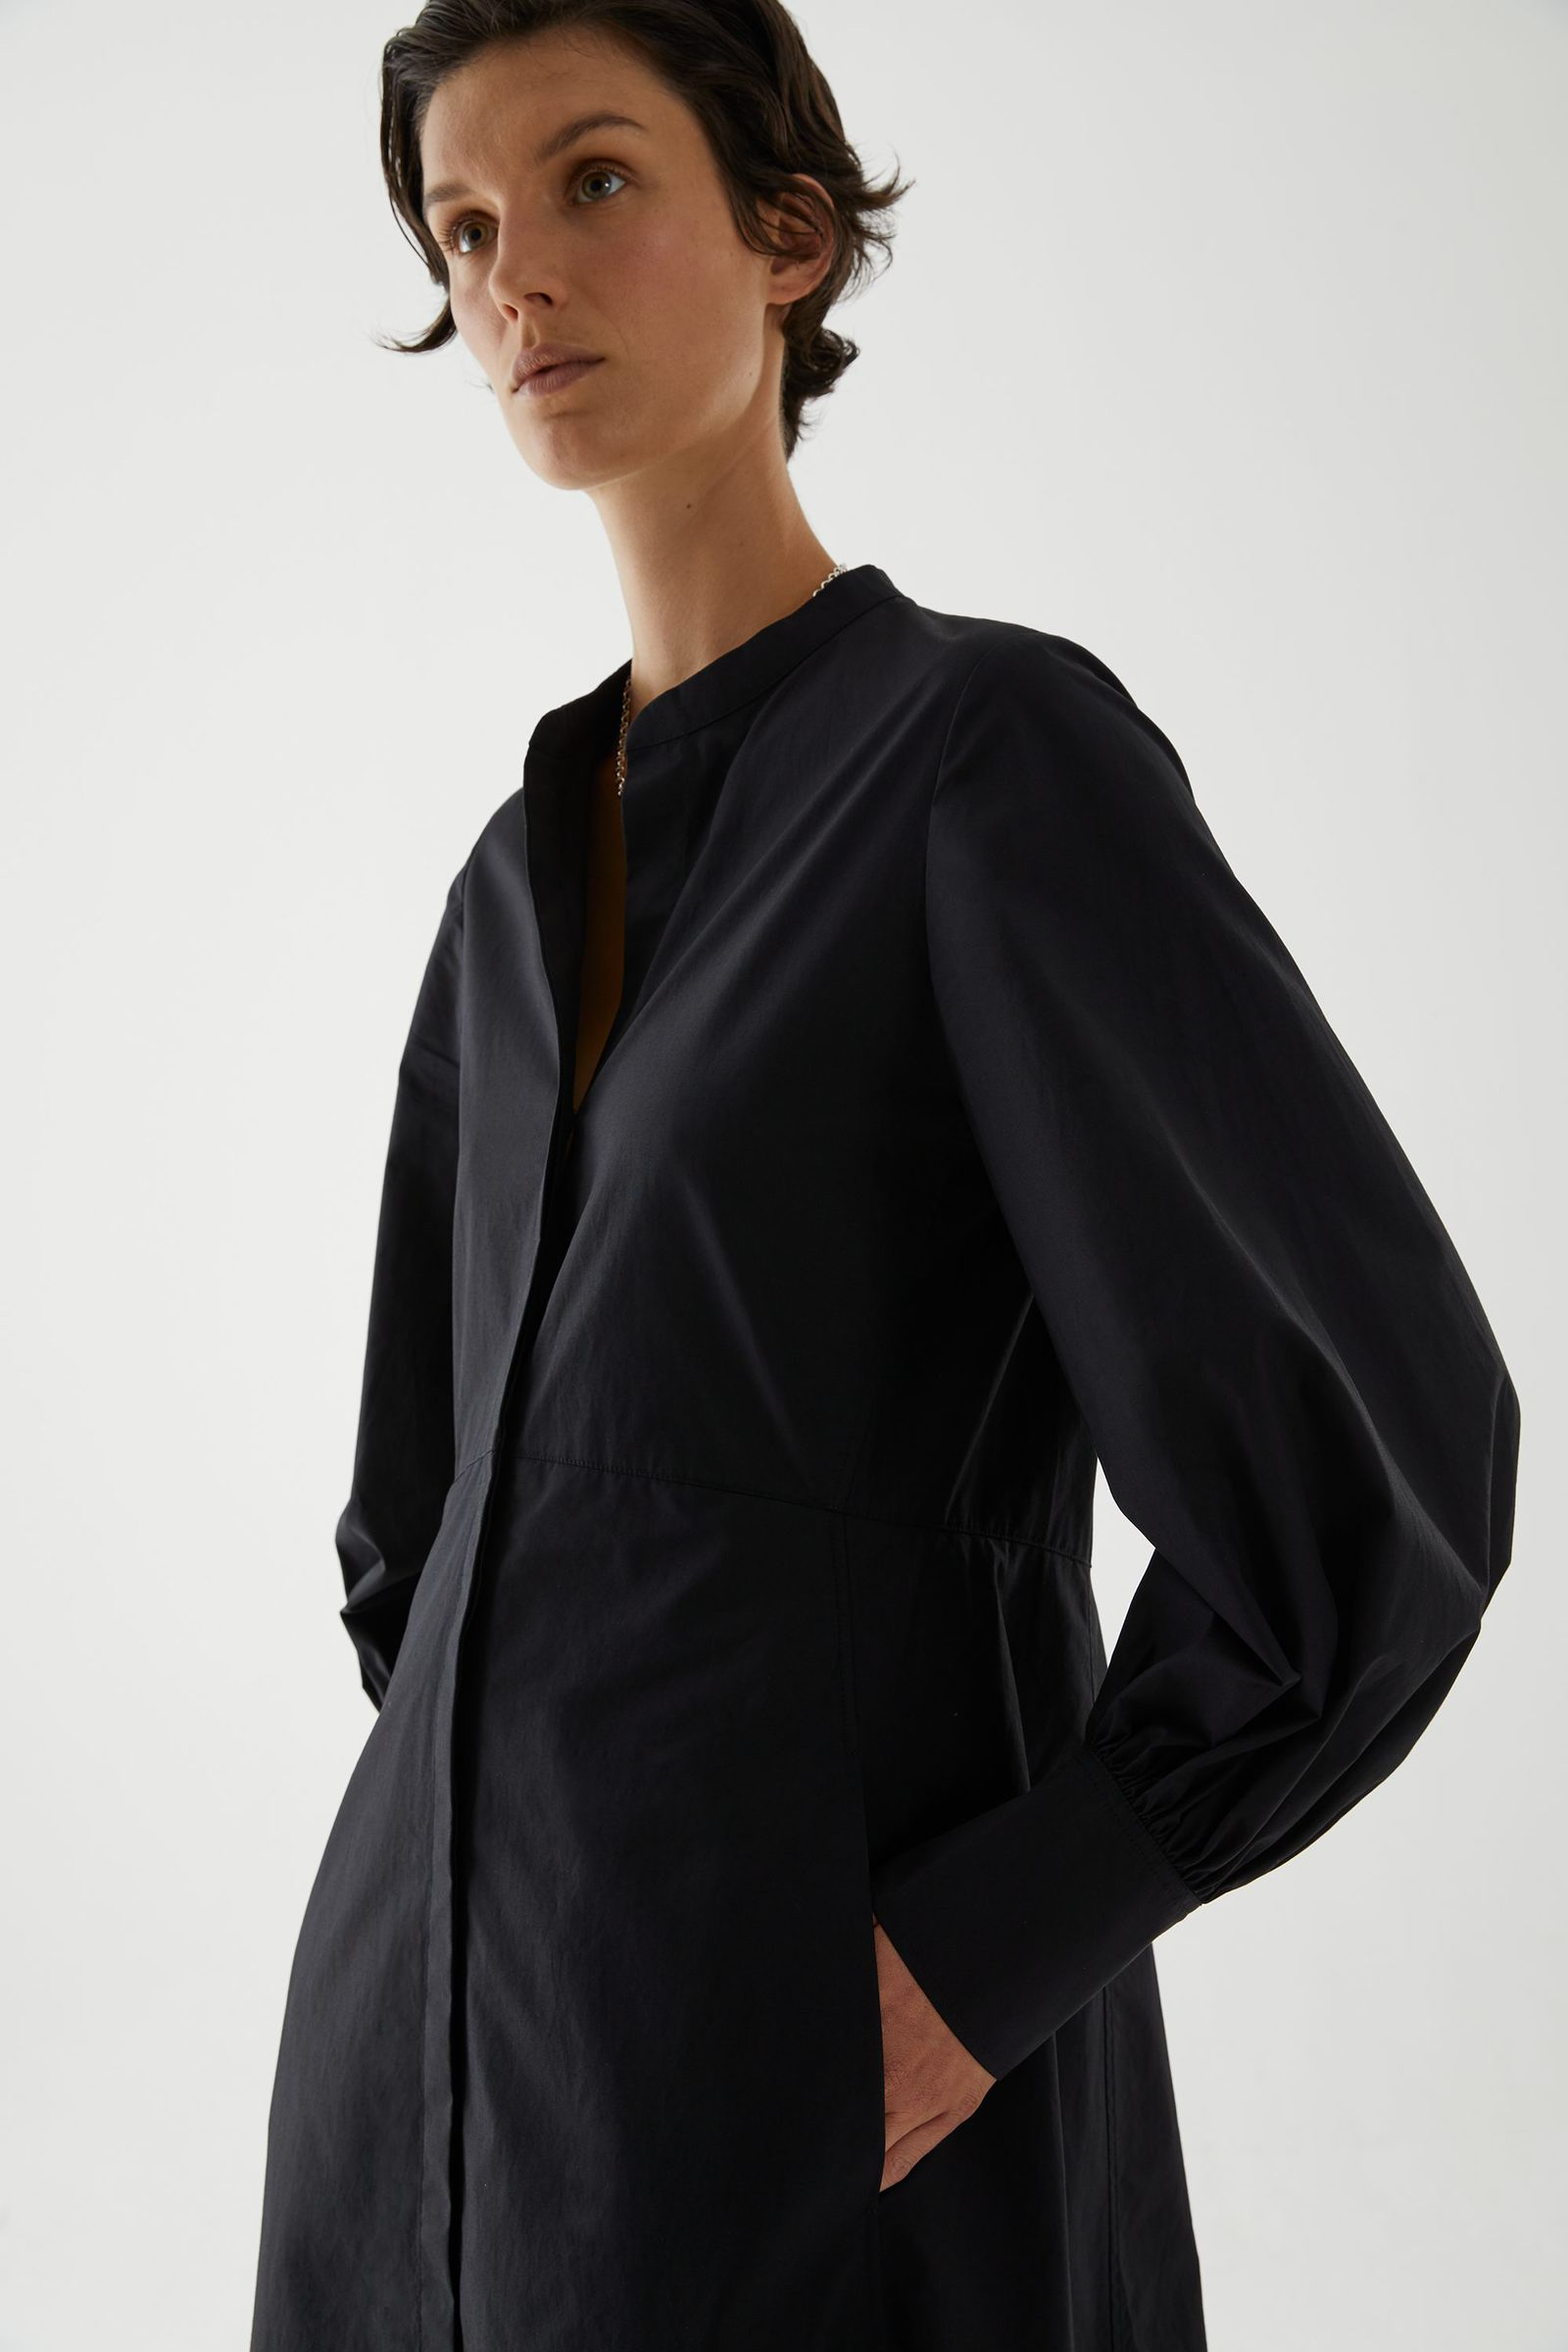 COS 코튼 볼륨 슬리브 미디 셔츠 드레스의 블랙컬러 ECOMLook입니다.